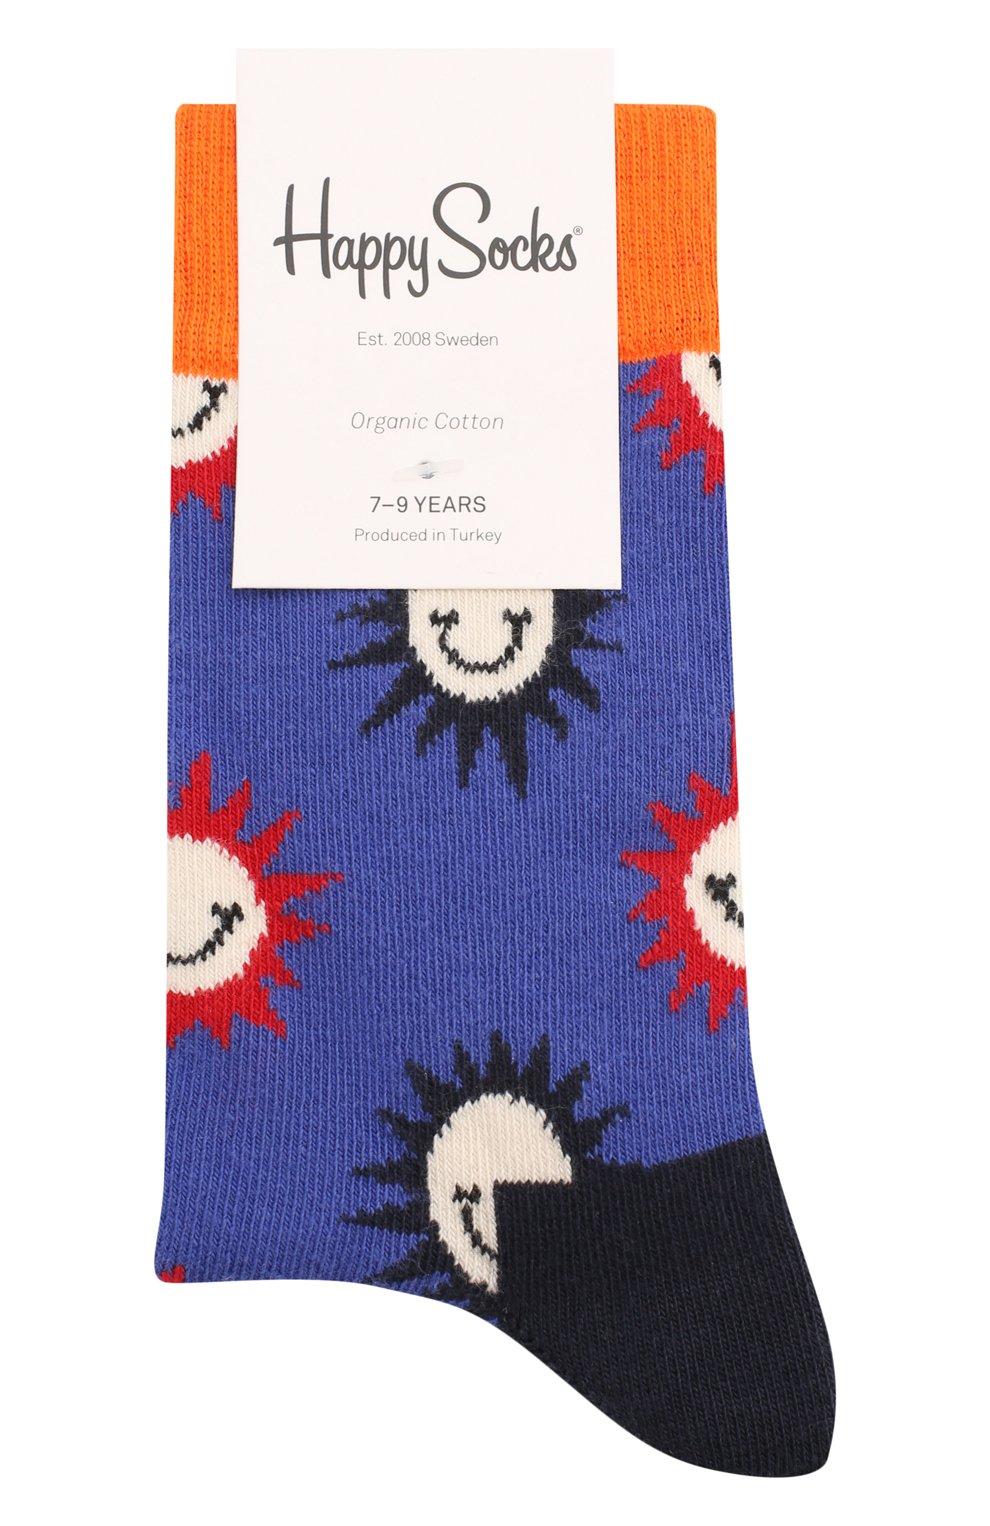 Детские носки HAPPY SOCKS разноцветного цвета, арт. KSMS01 | Фото 1 (Материал: Текстиль, Хлопок)